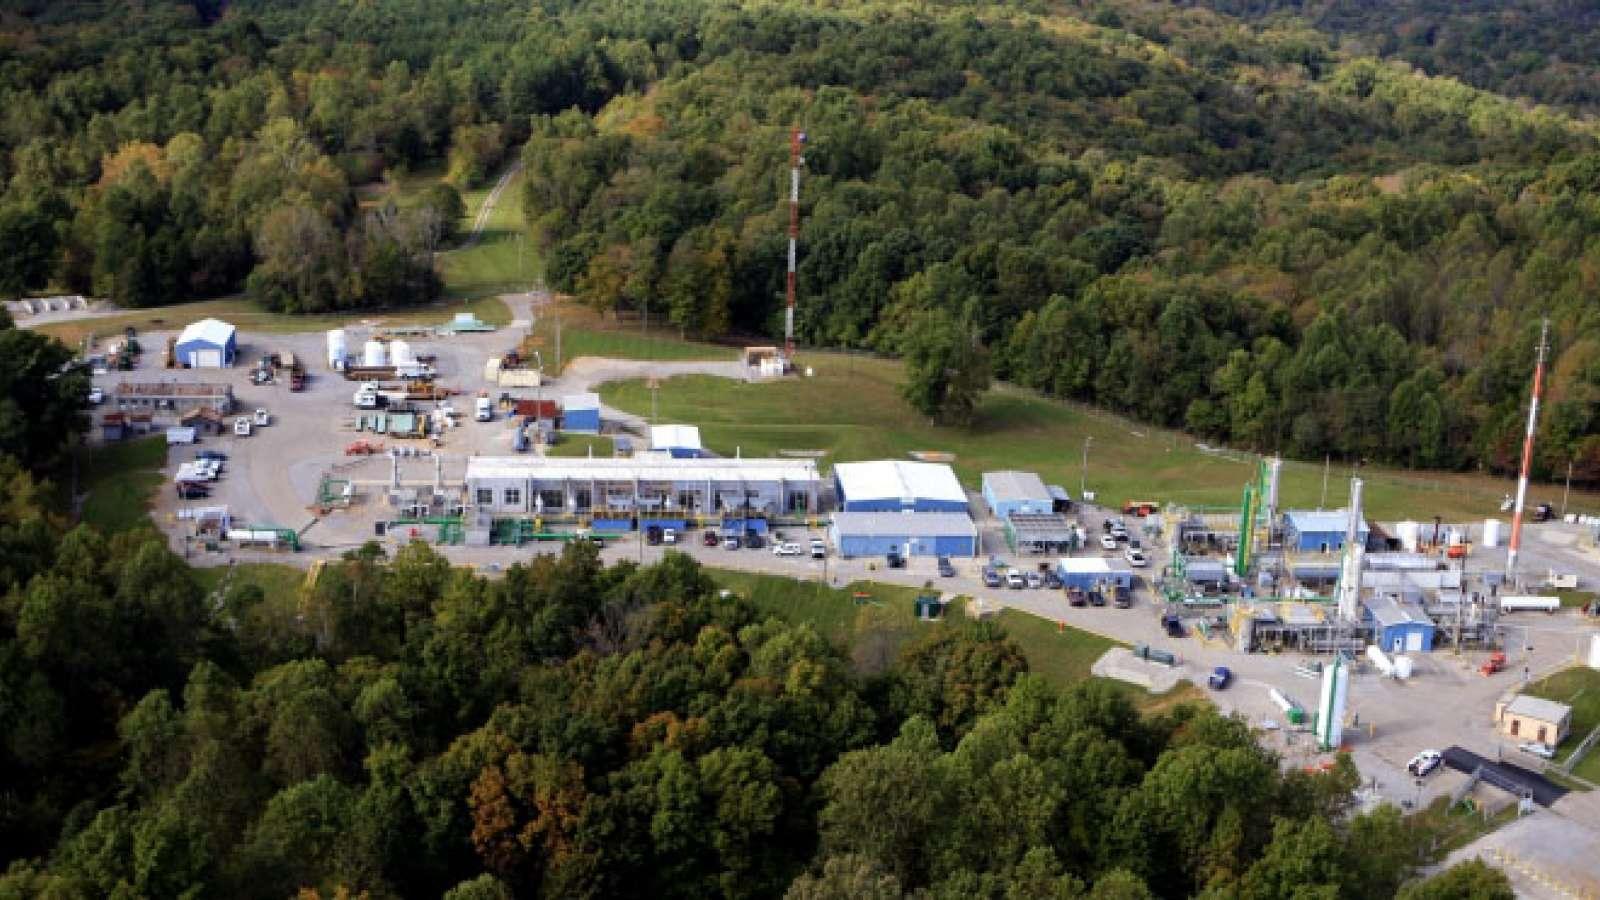 Aerial view of Muldraugh Compressor Station